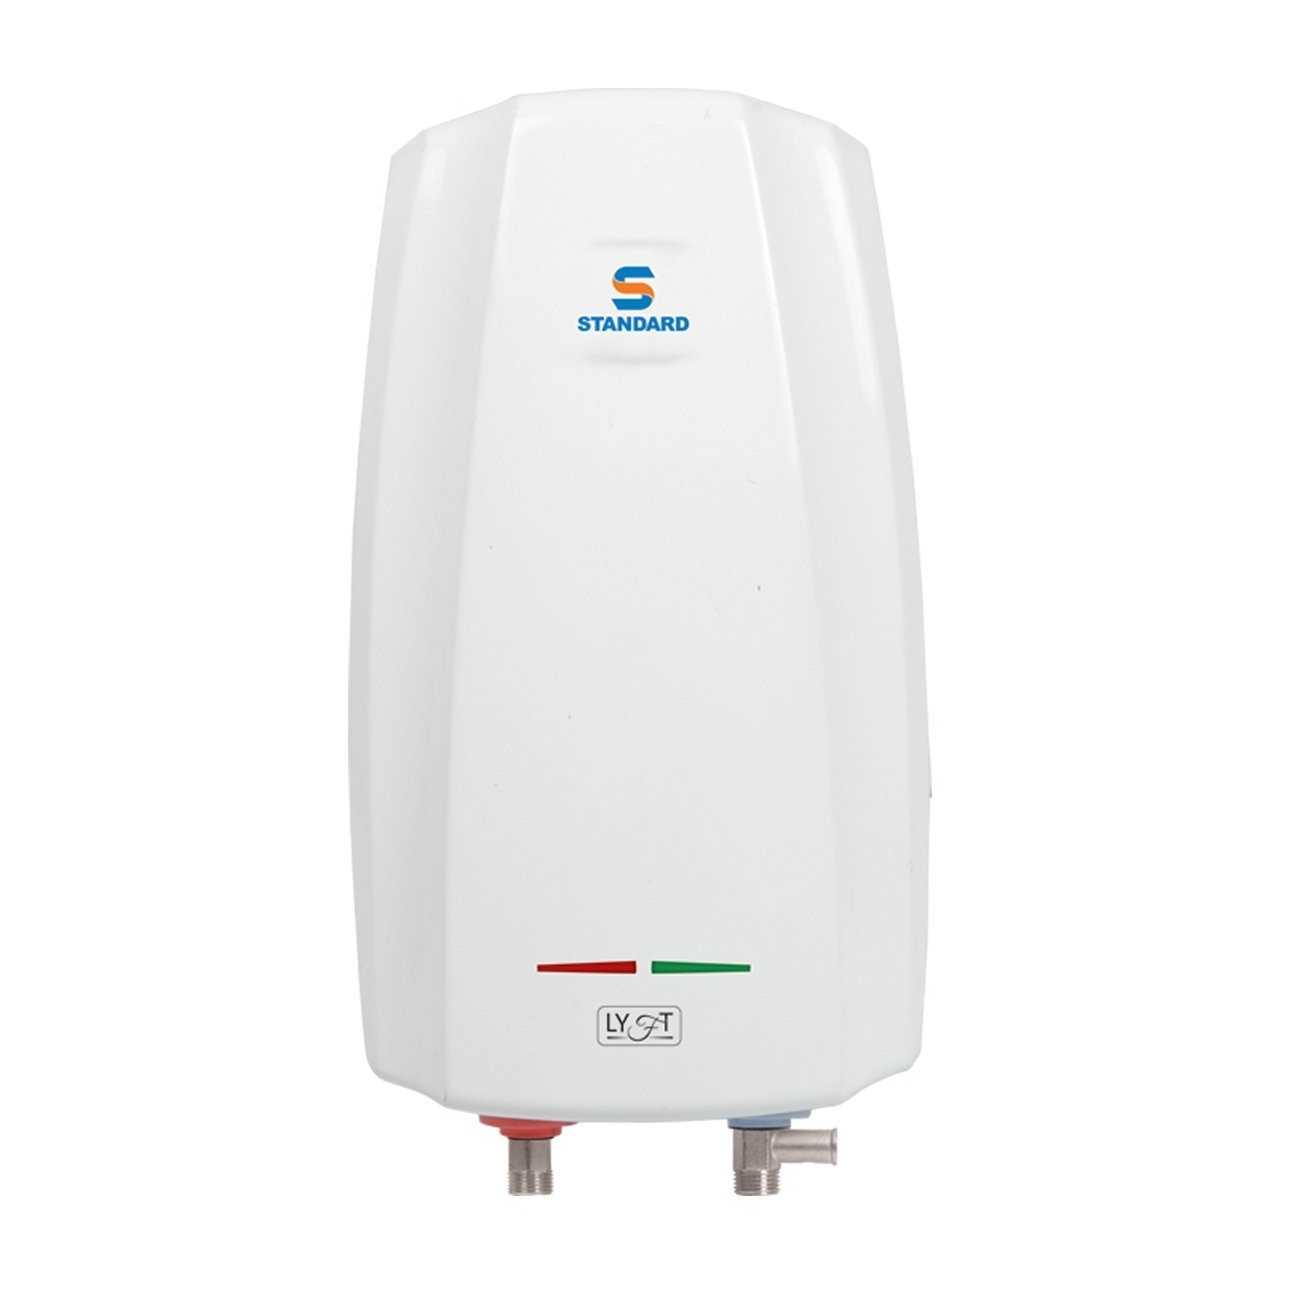 Standard Lyft 1 Litre Instant Water Geyser